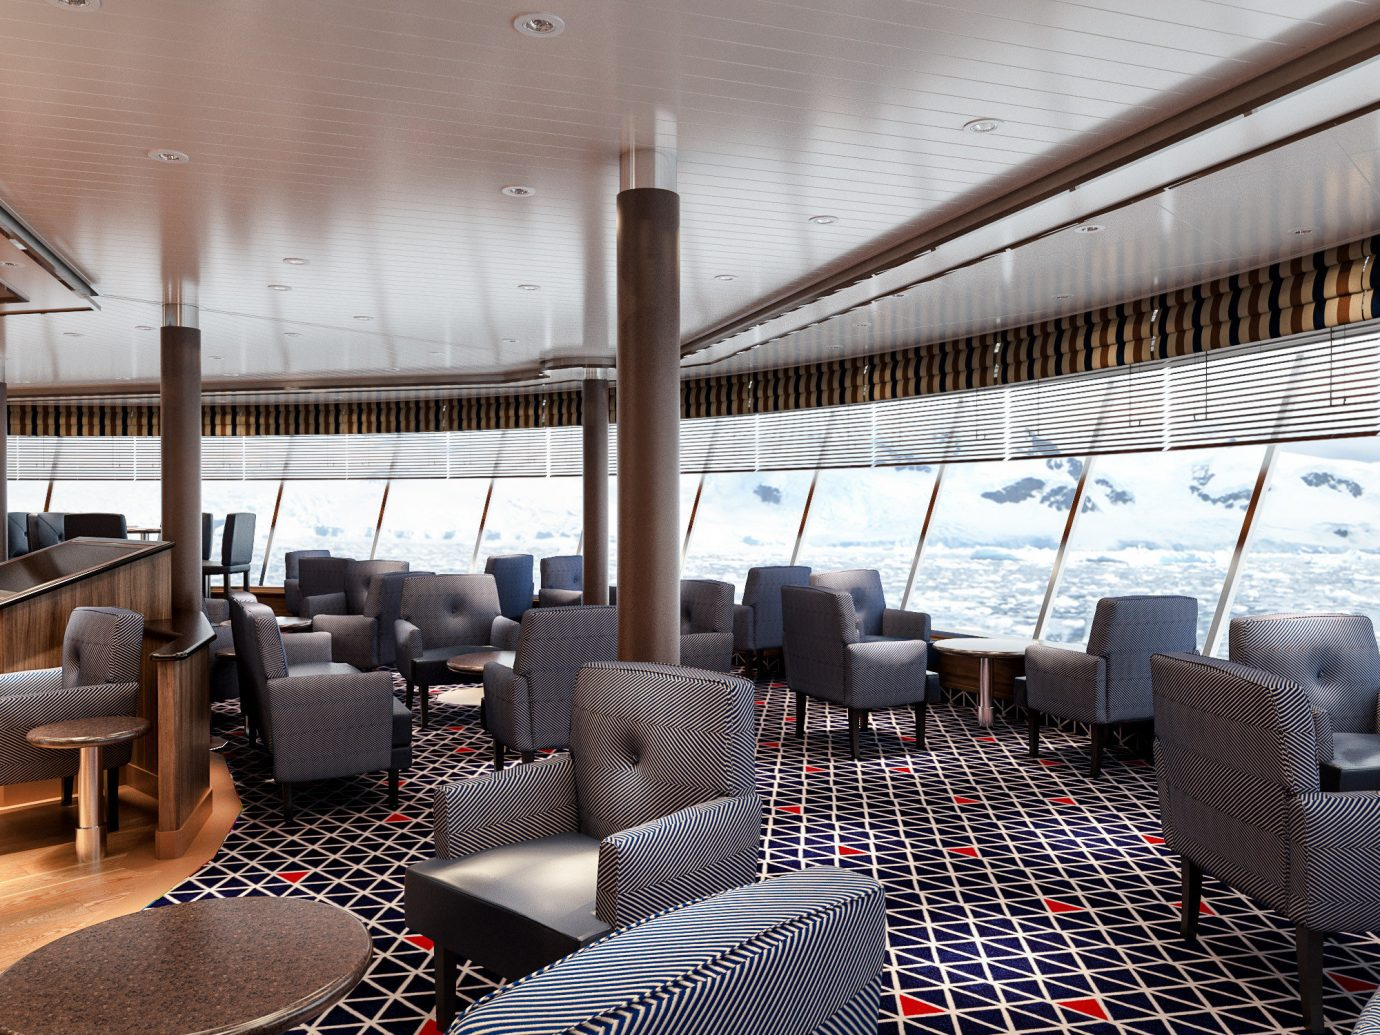 Cruise Travel Luxury Travel Trip Ideas indoor room restaurant interior design table Deck furniture several